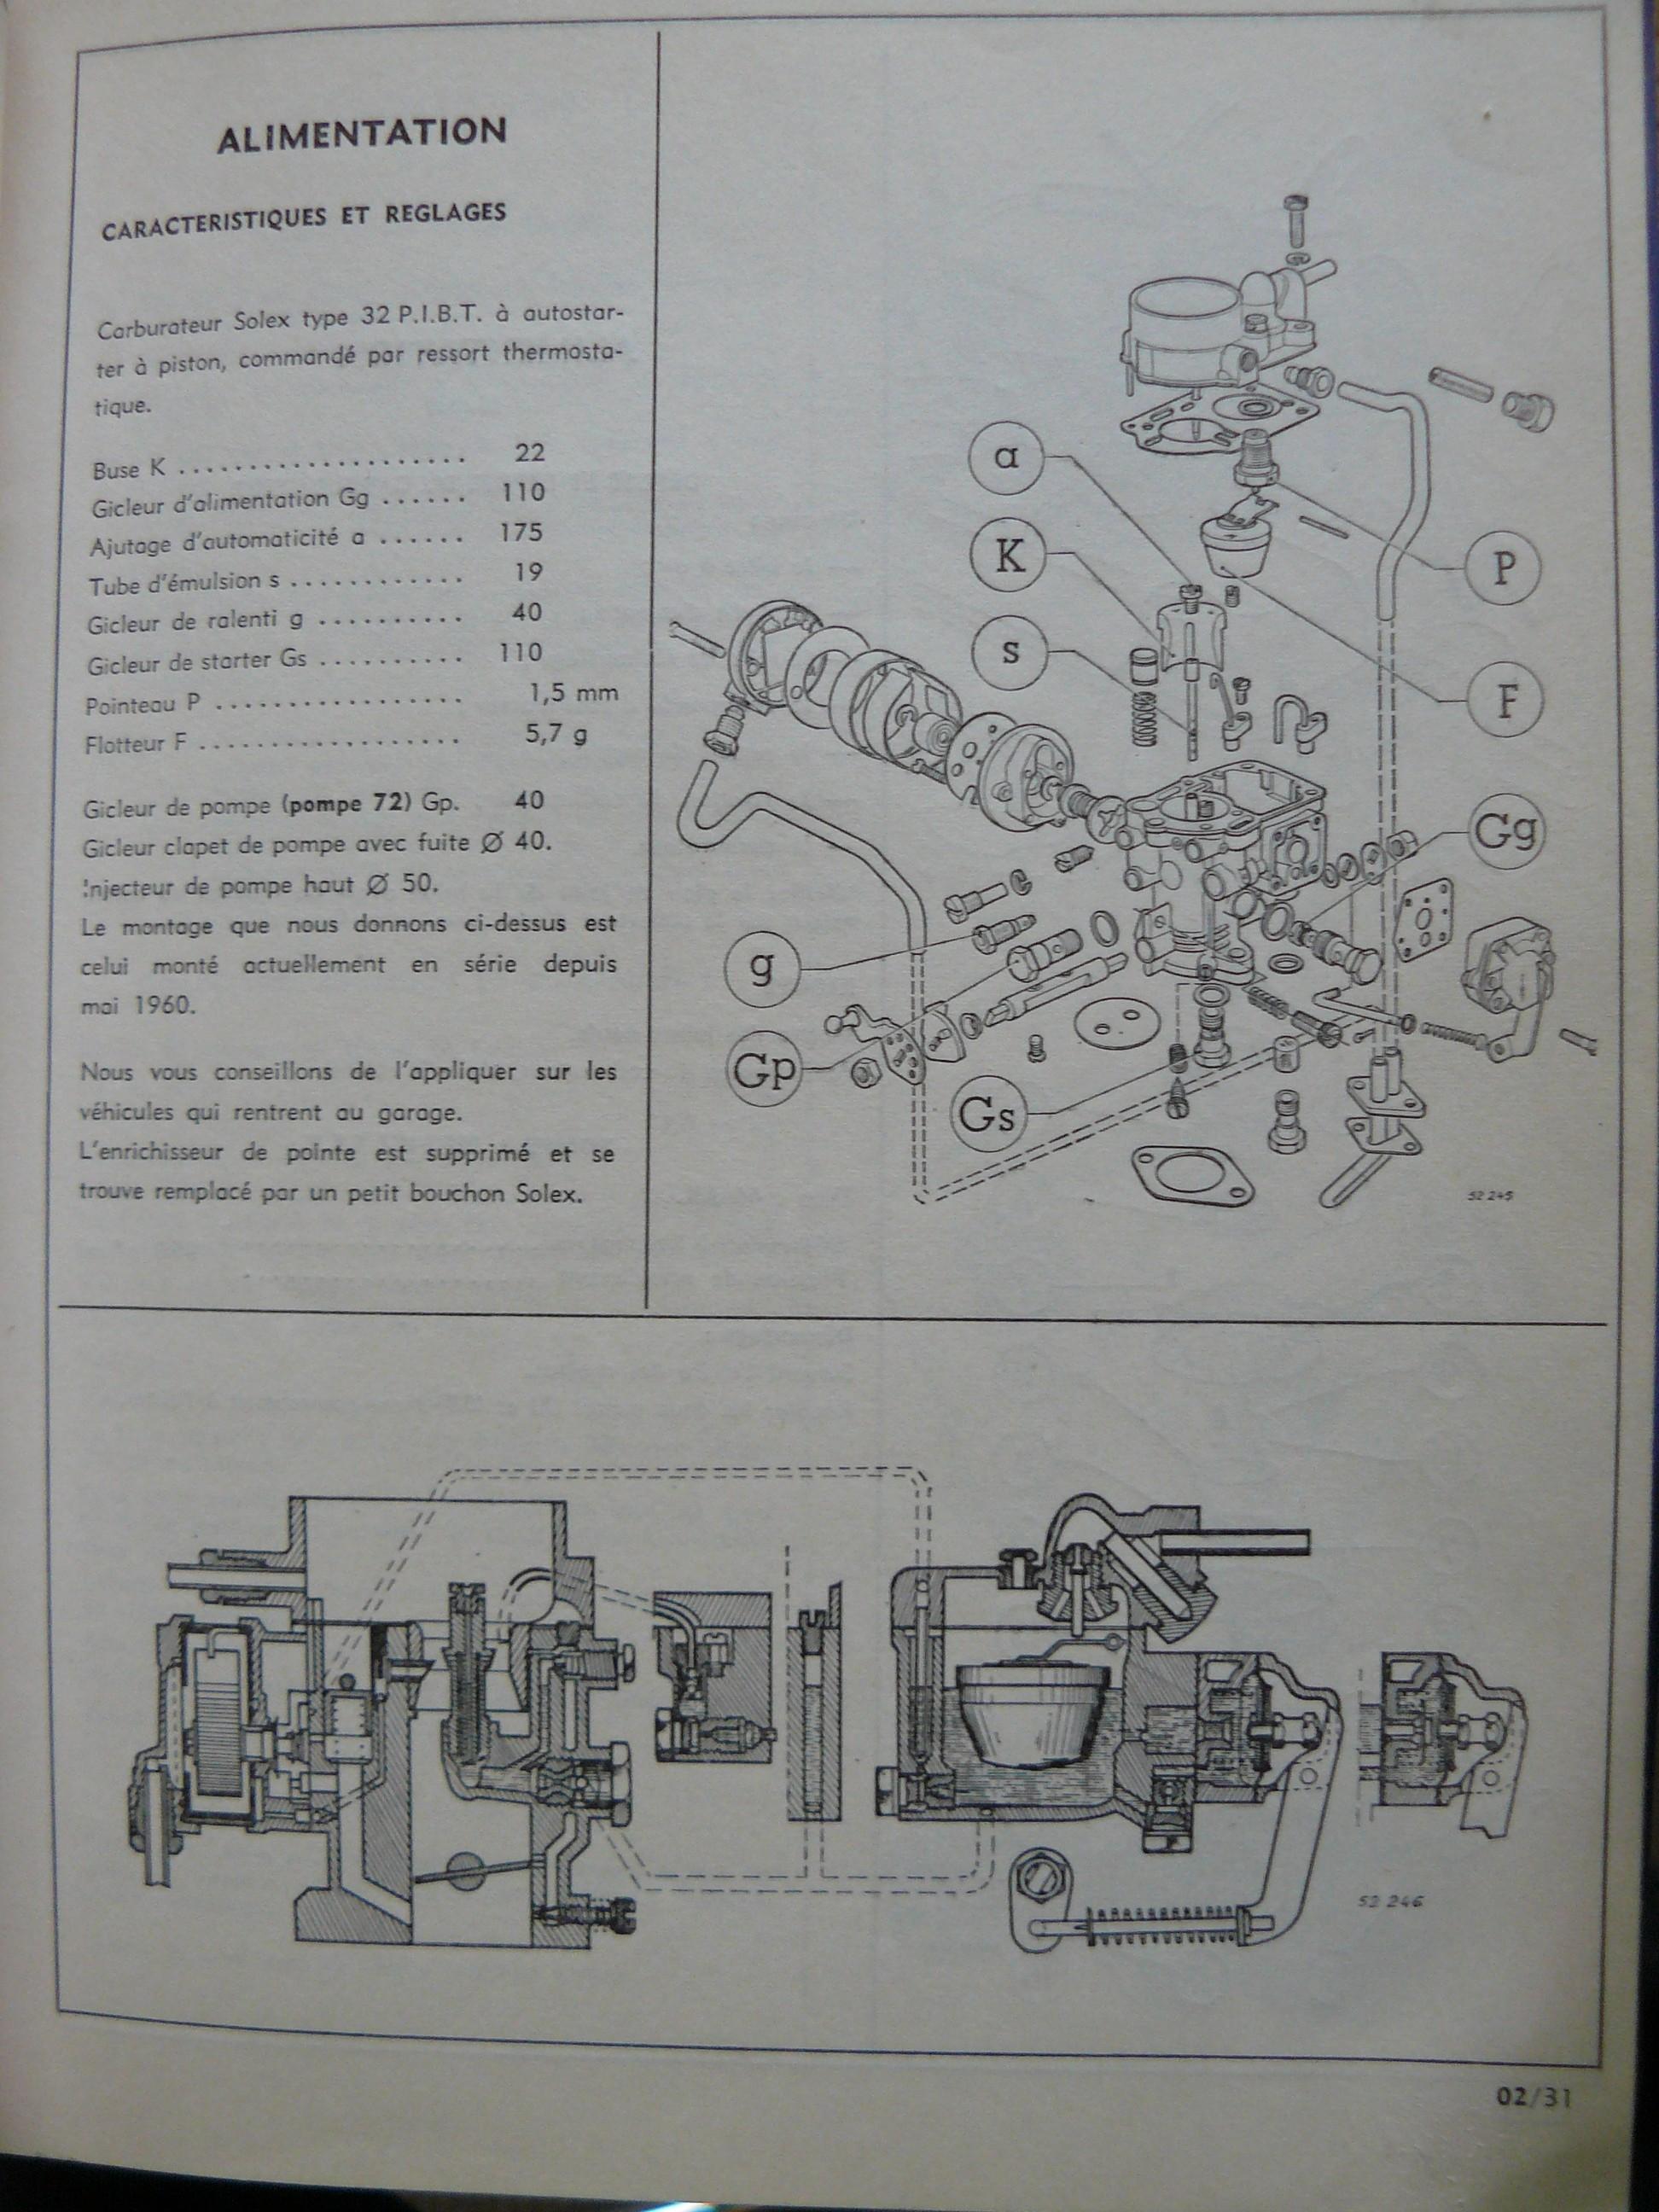 carburateur solex 32 pibt